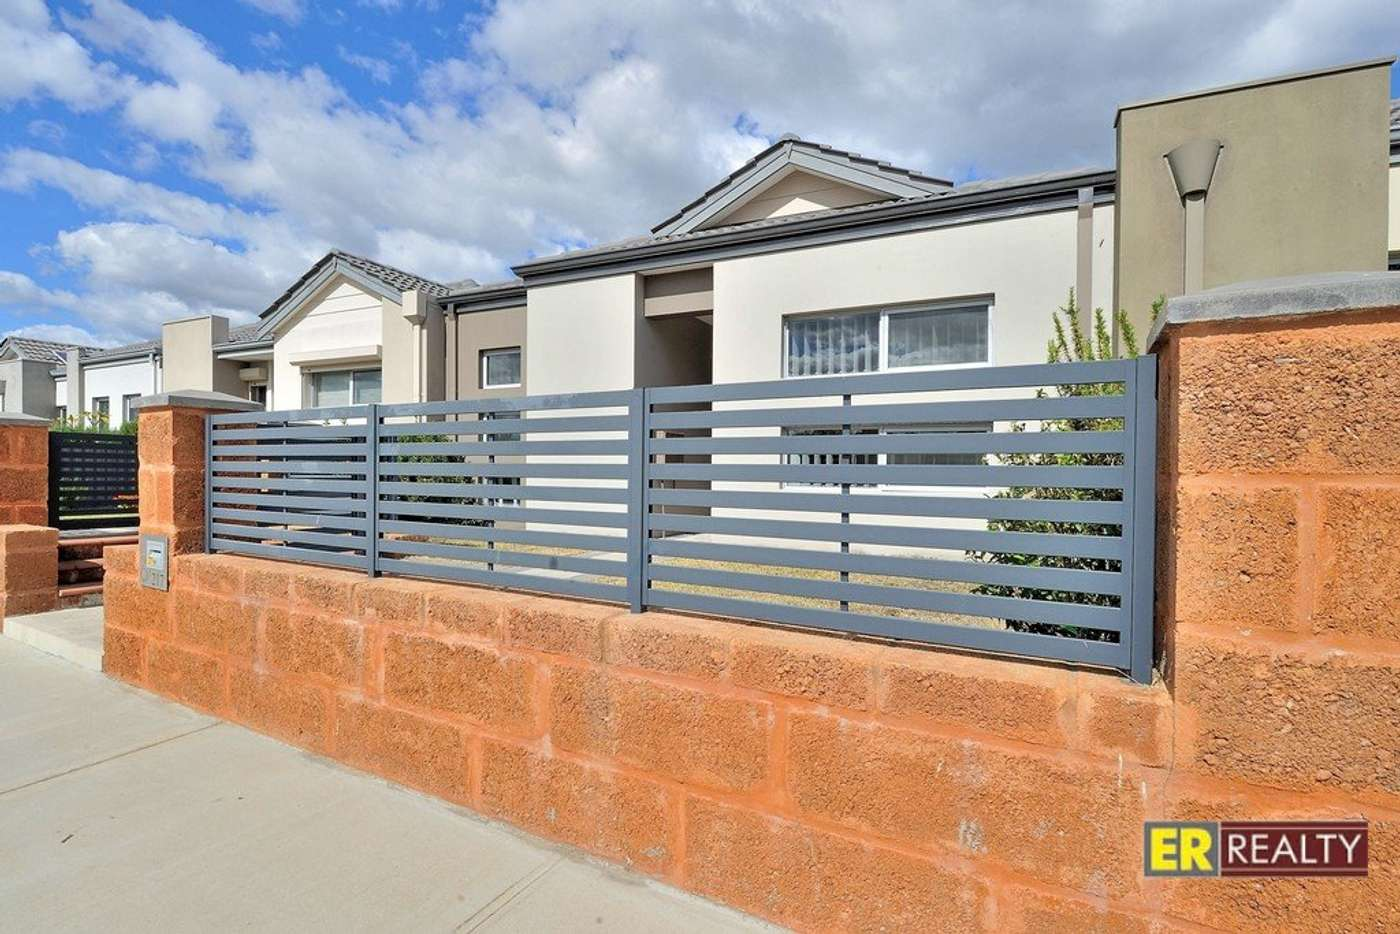 Main view of Homely house listing, 217 Suffolk Street, Caversham WA 6055